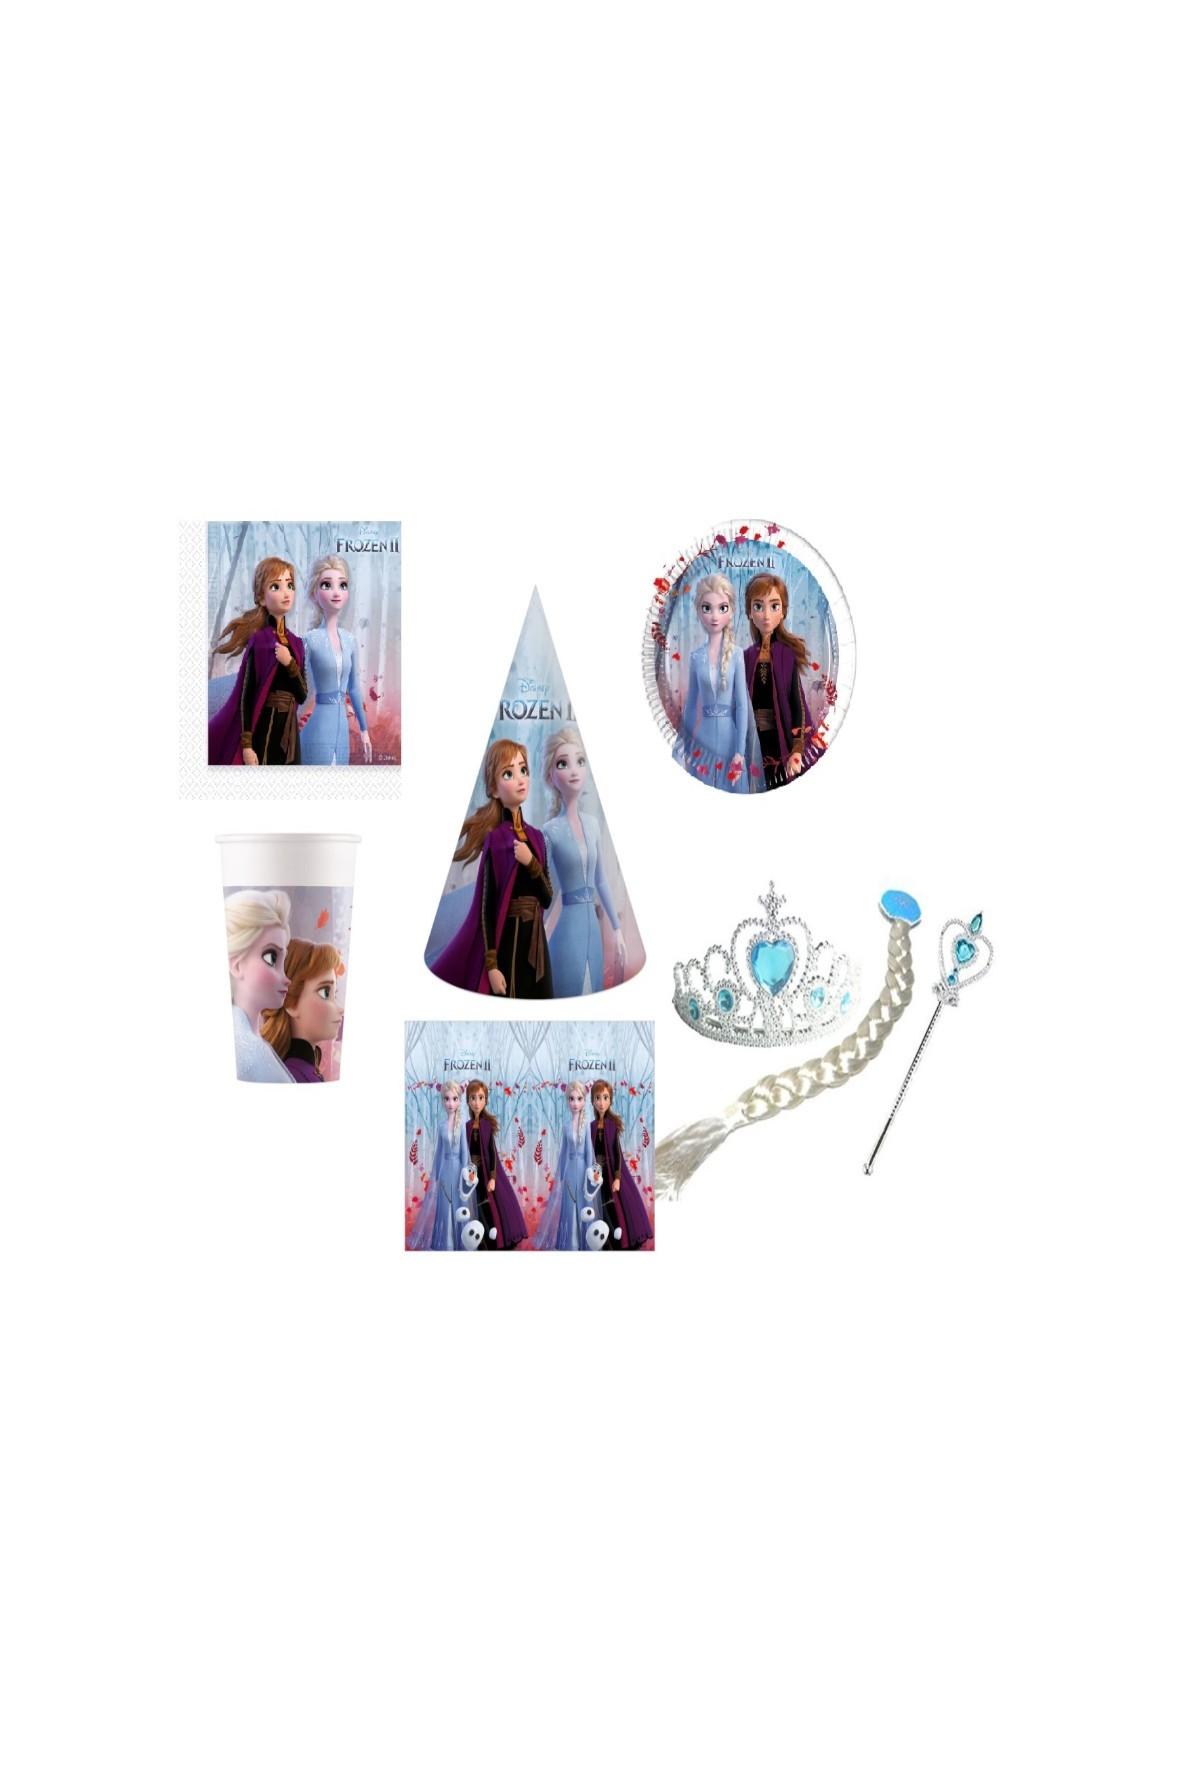 Zestaw urodzinowy Frozen II  - 44 elementy